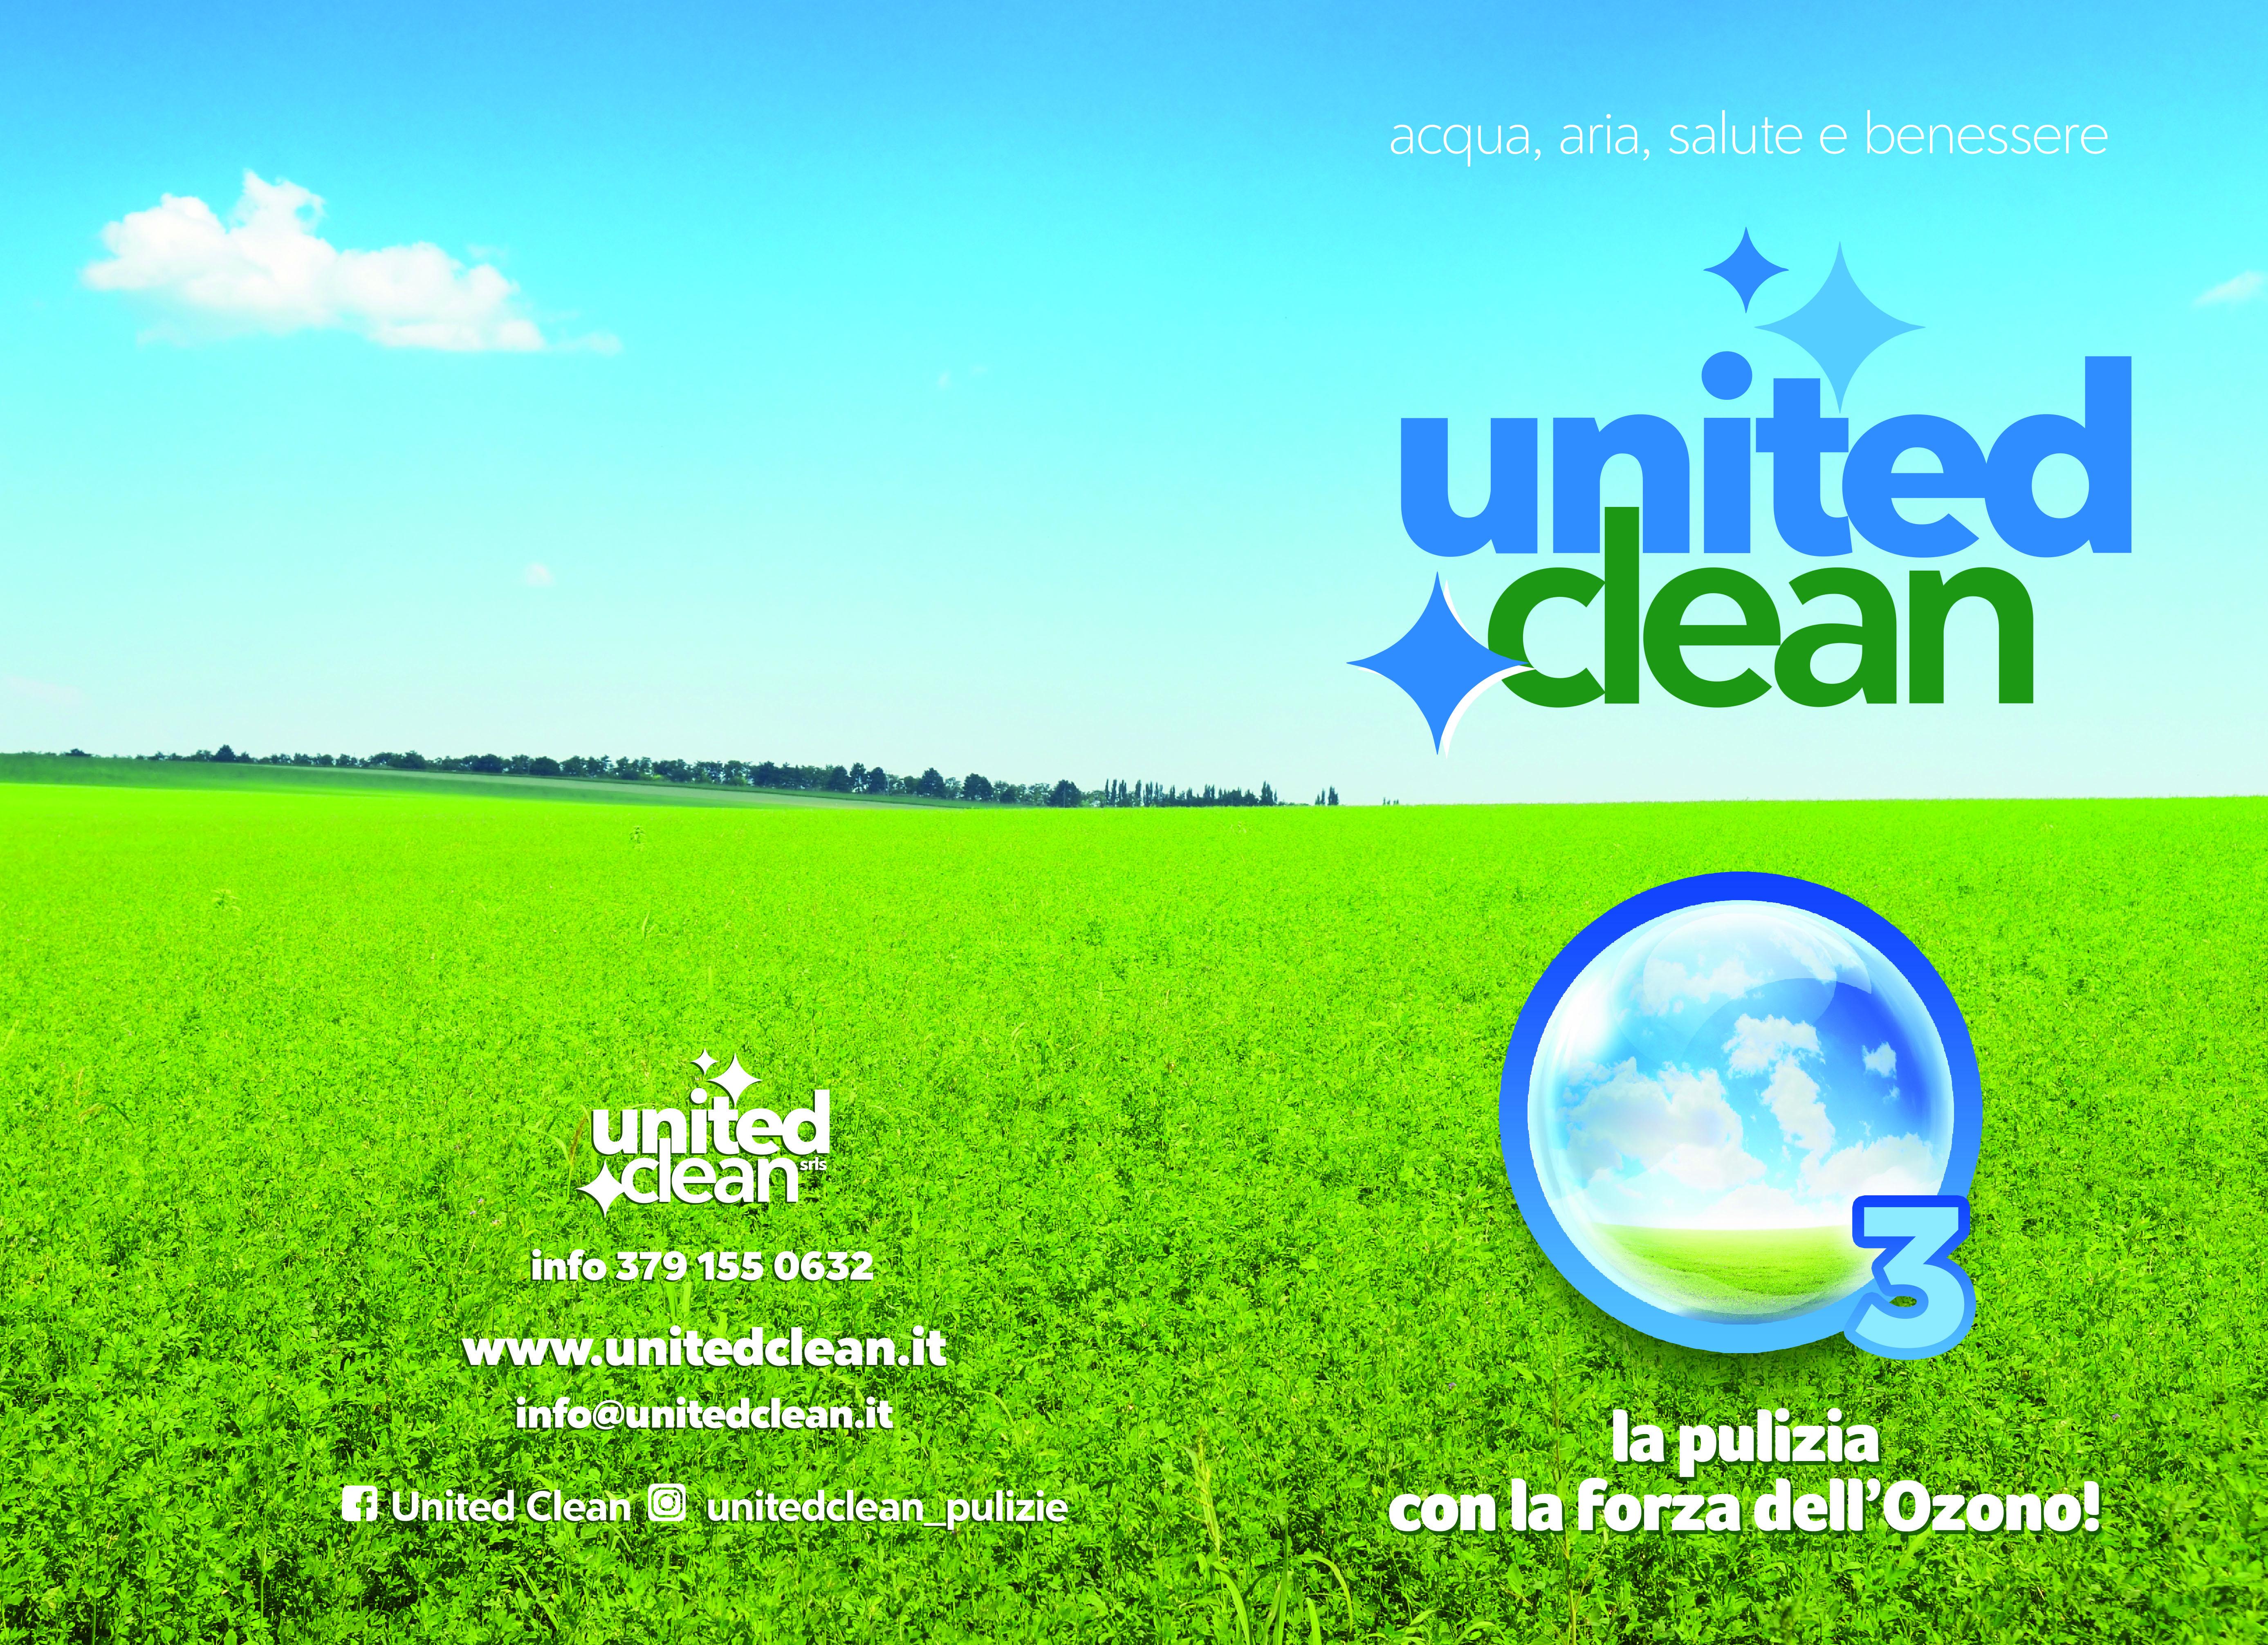 United Clean